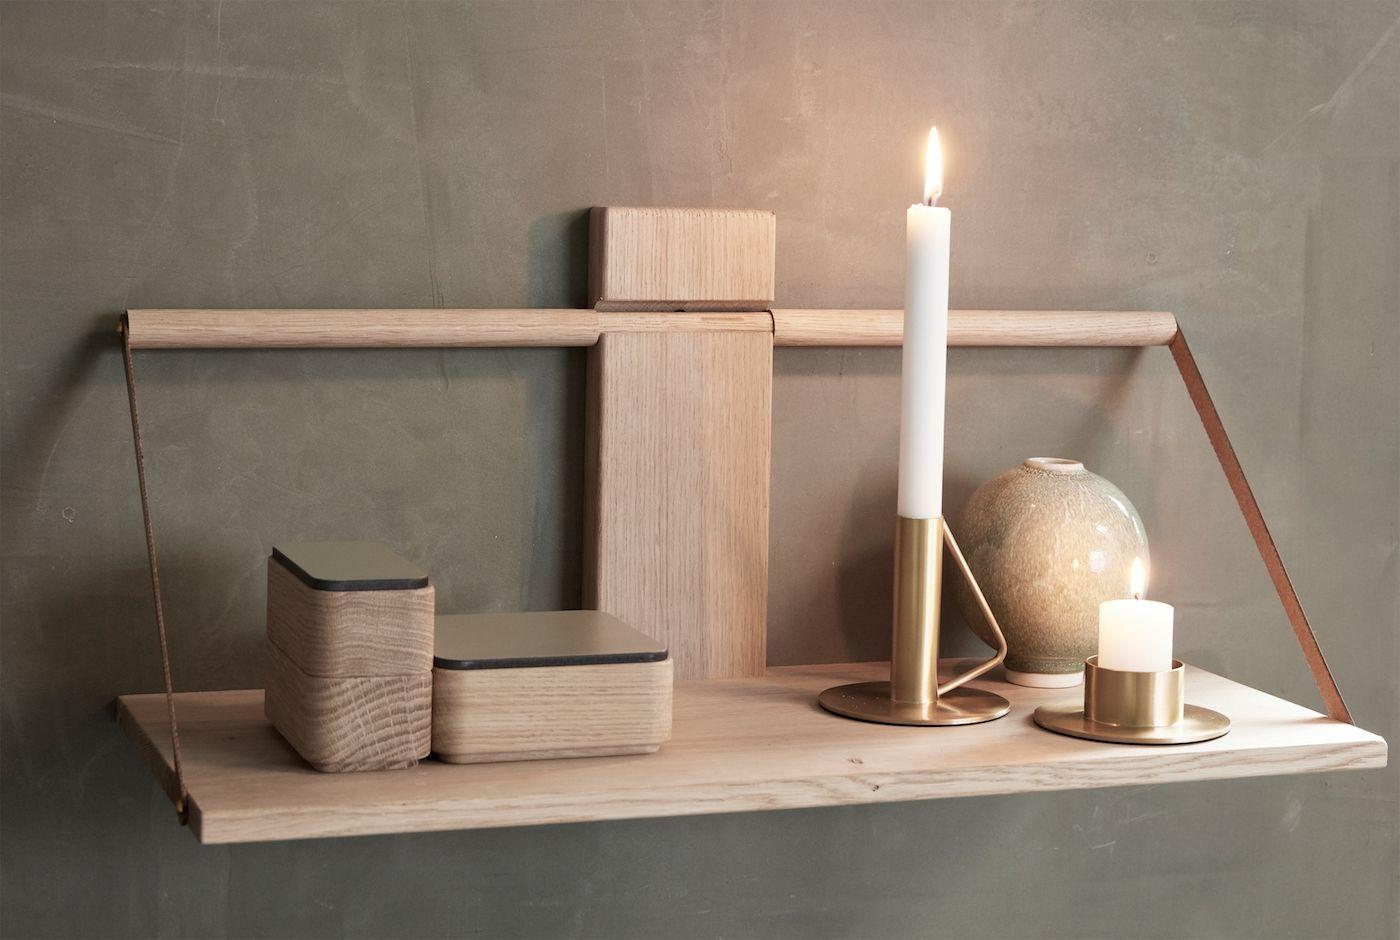 Andersen Shelf wood wall - Large, Eg